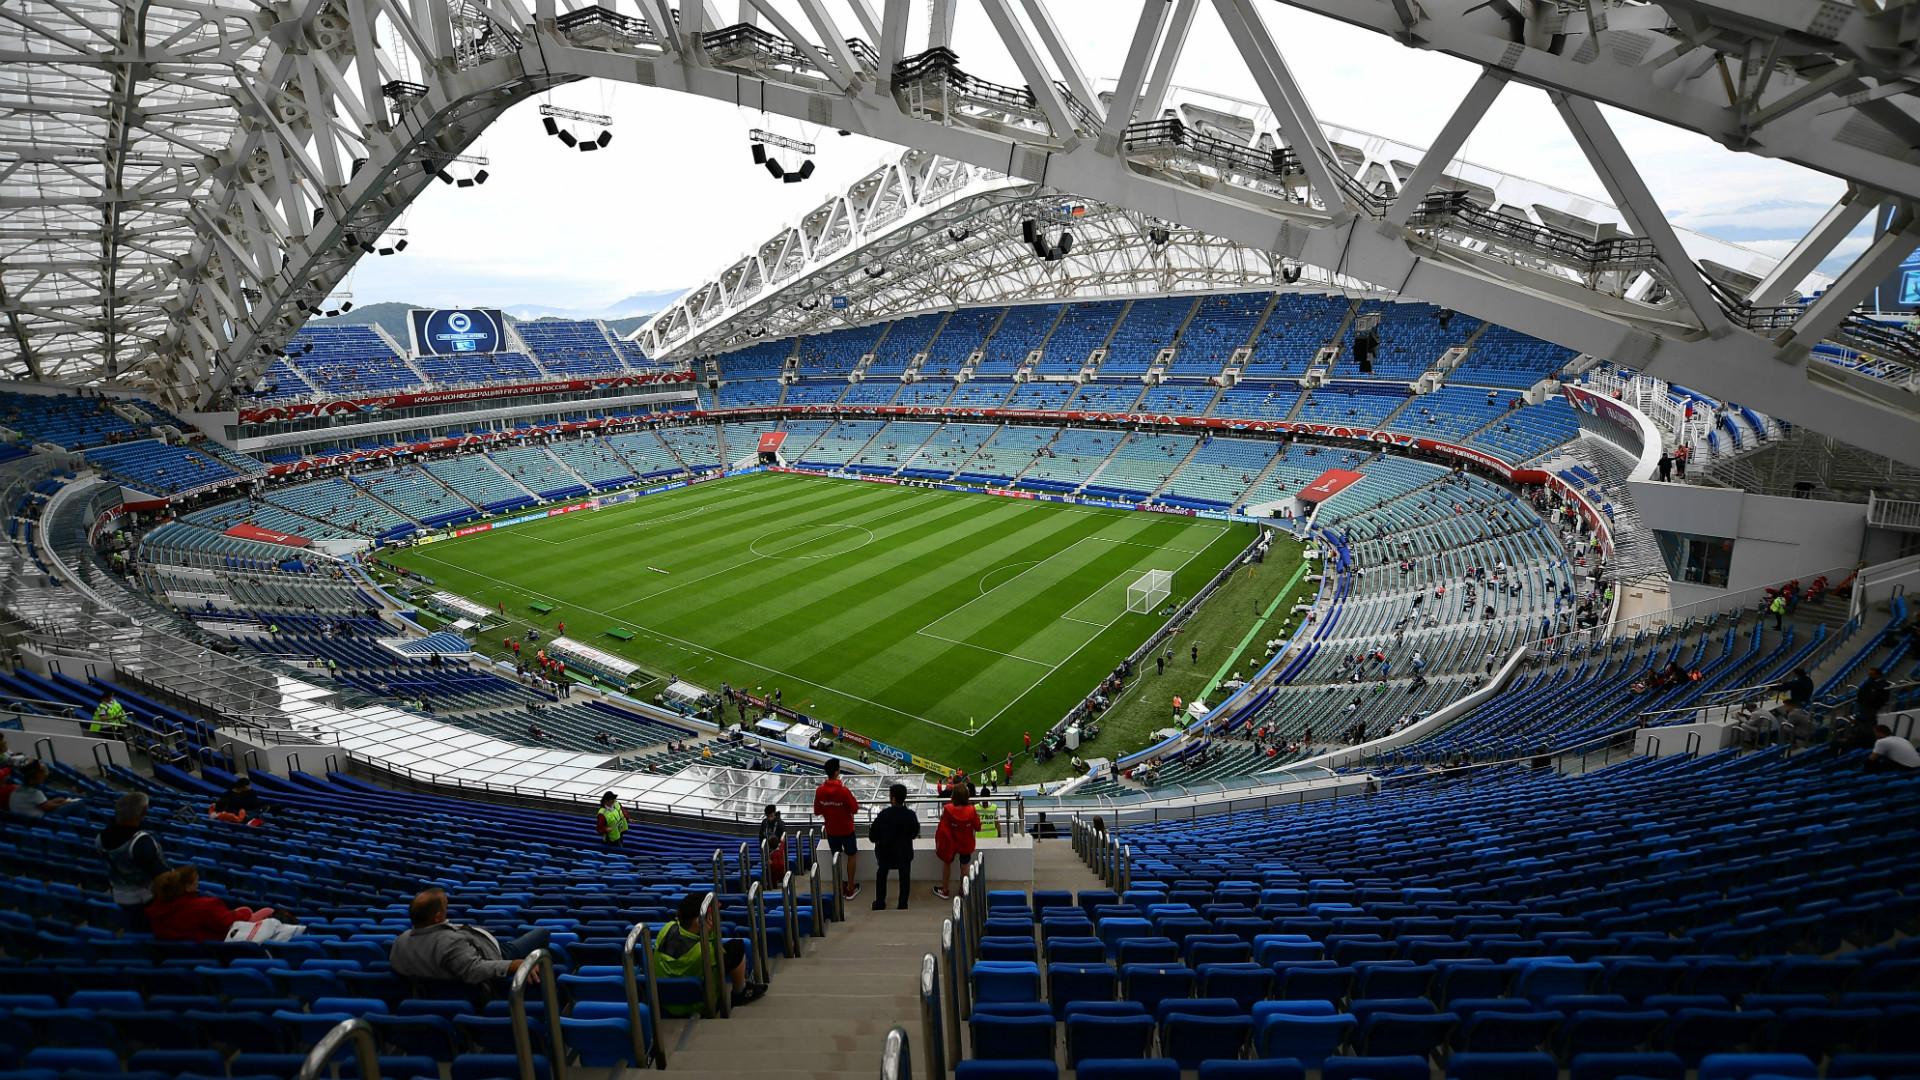 Fisht Stadium Sochi